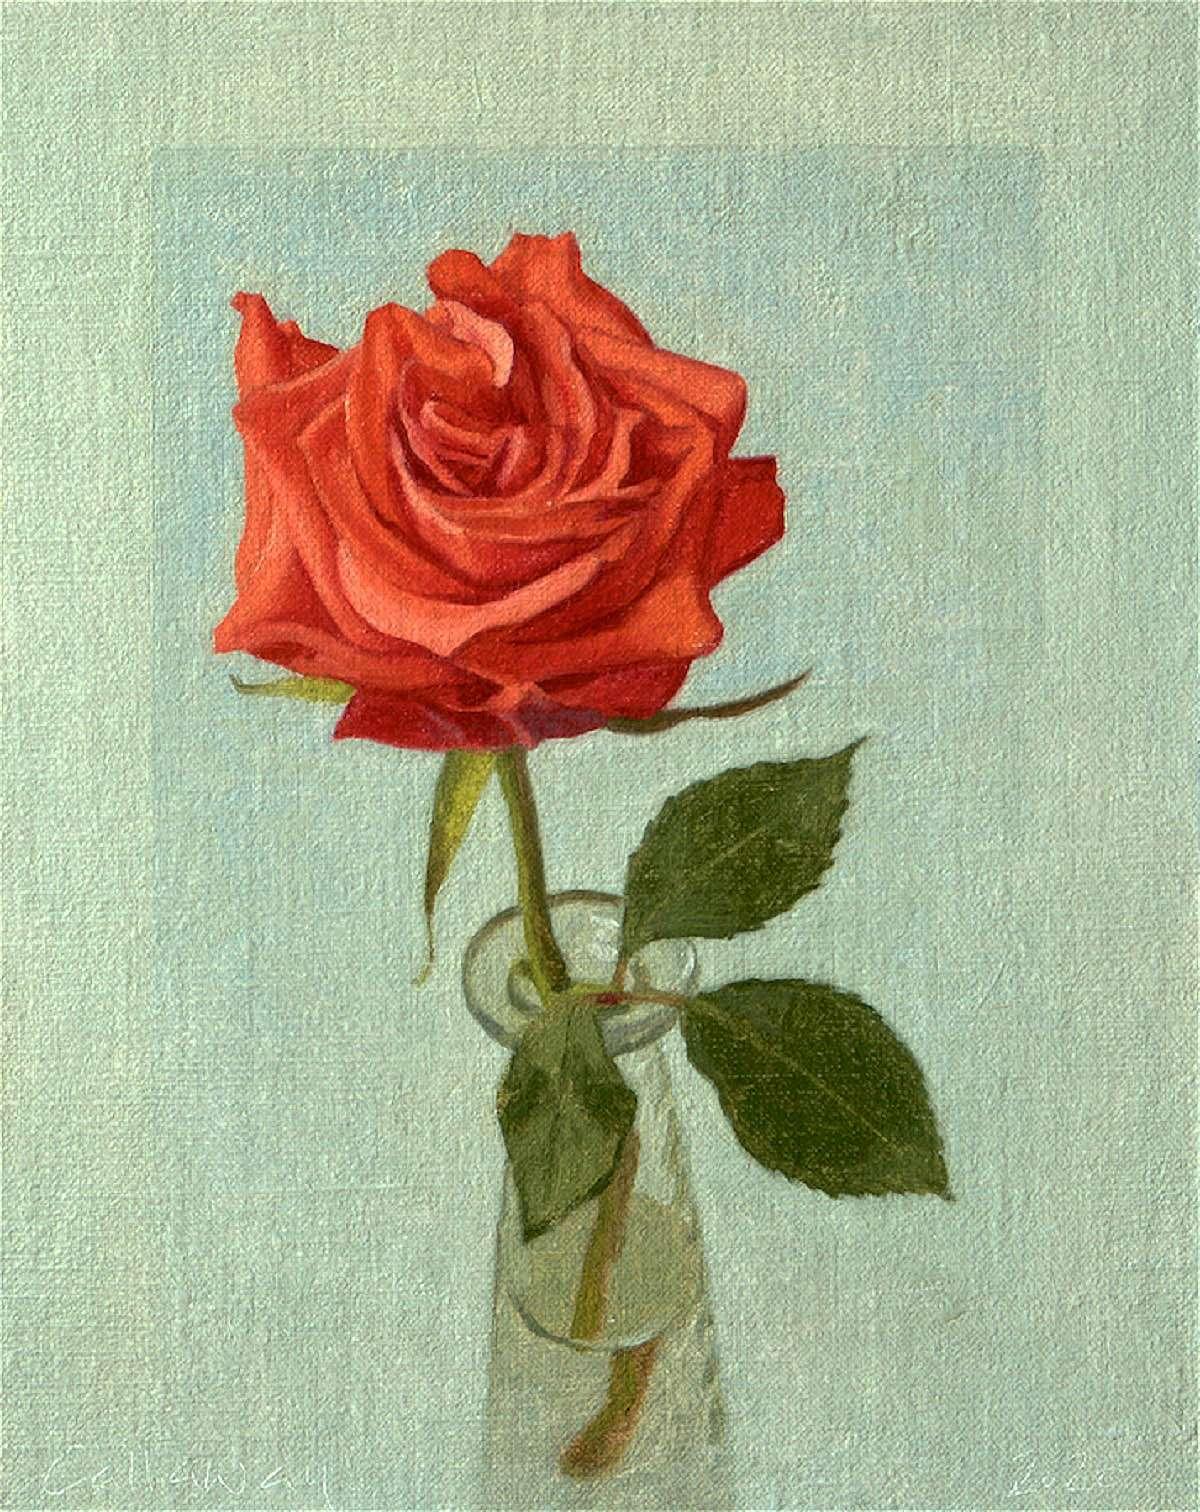 Alex Callaway, 'Rose', oil on board